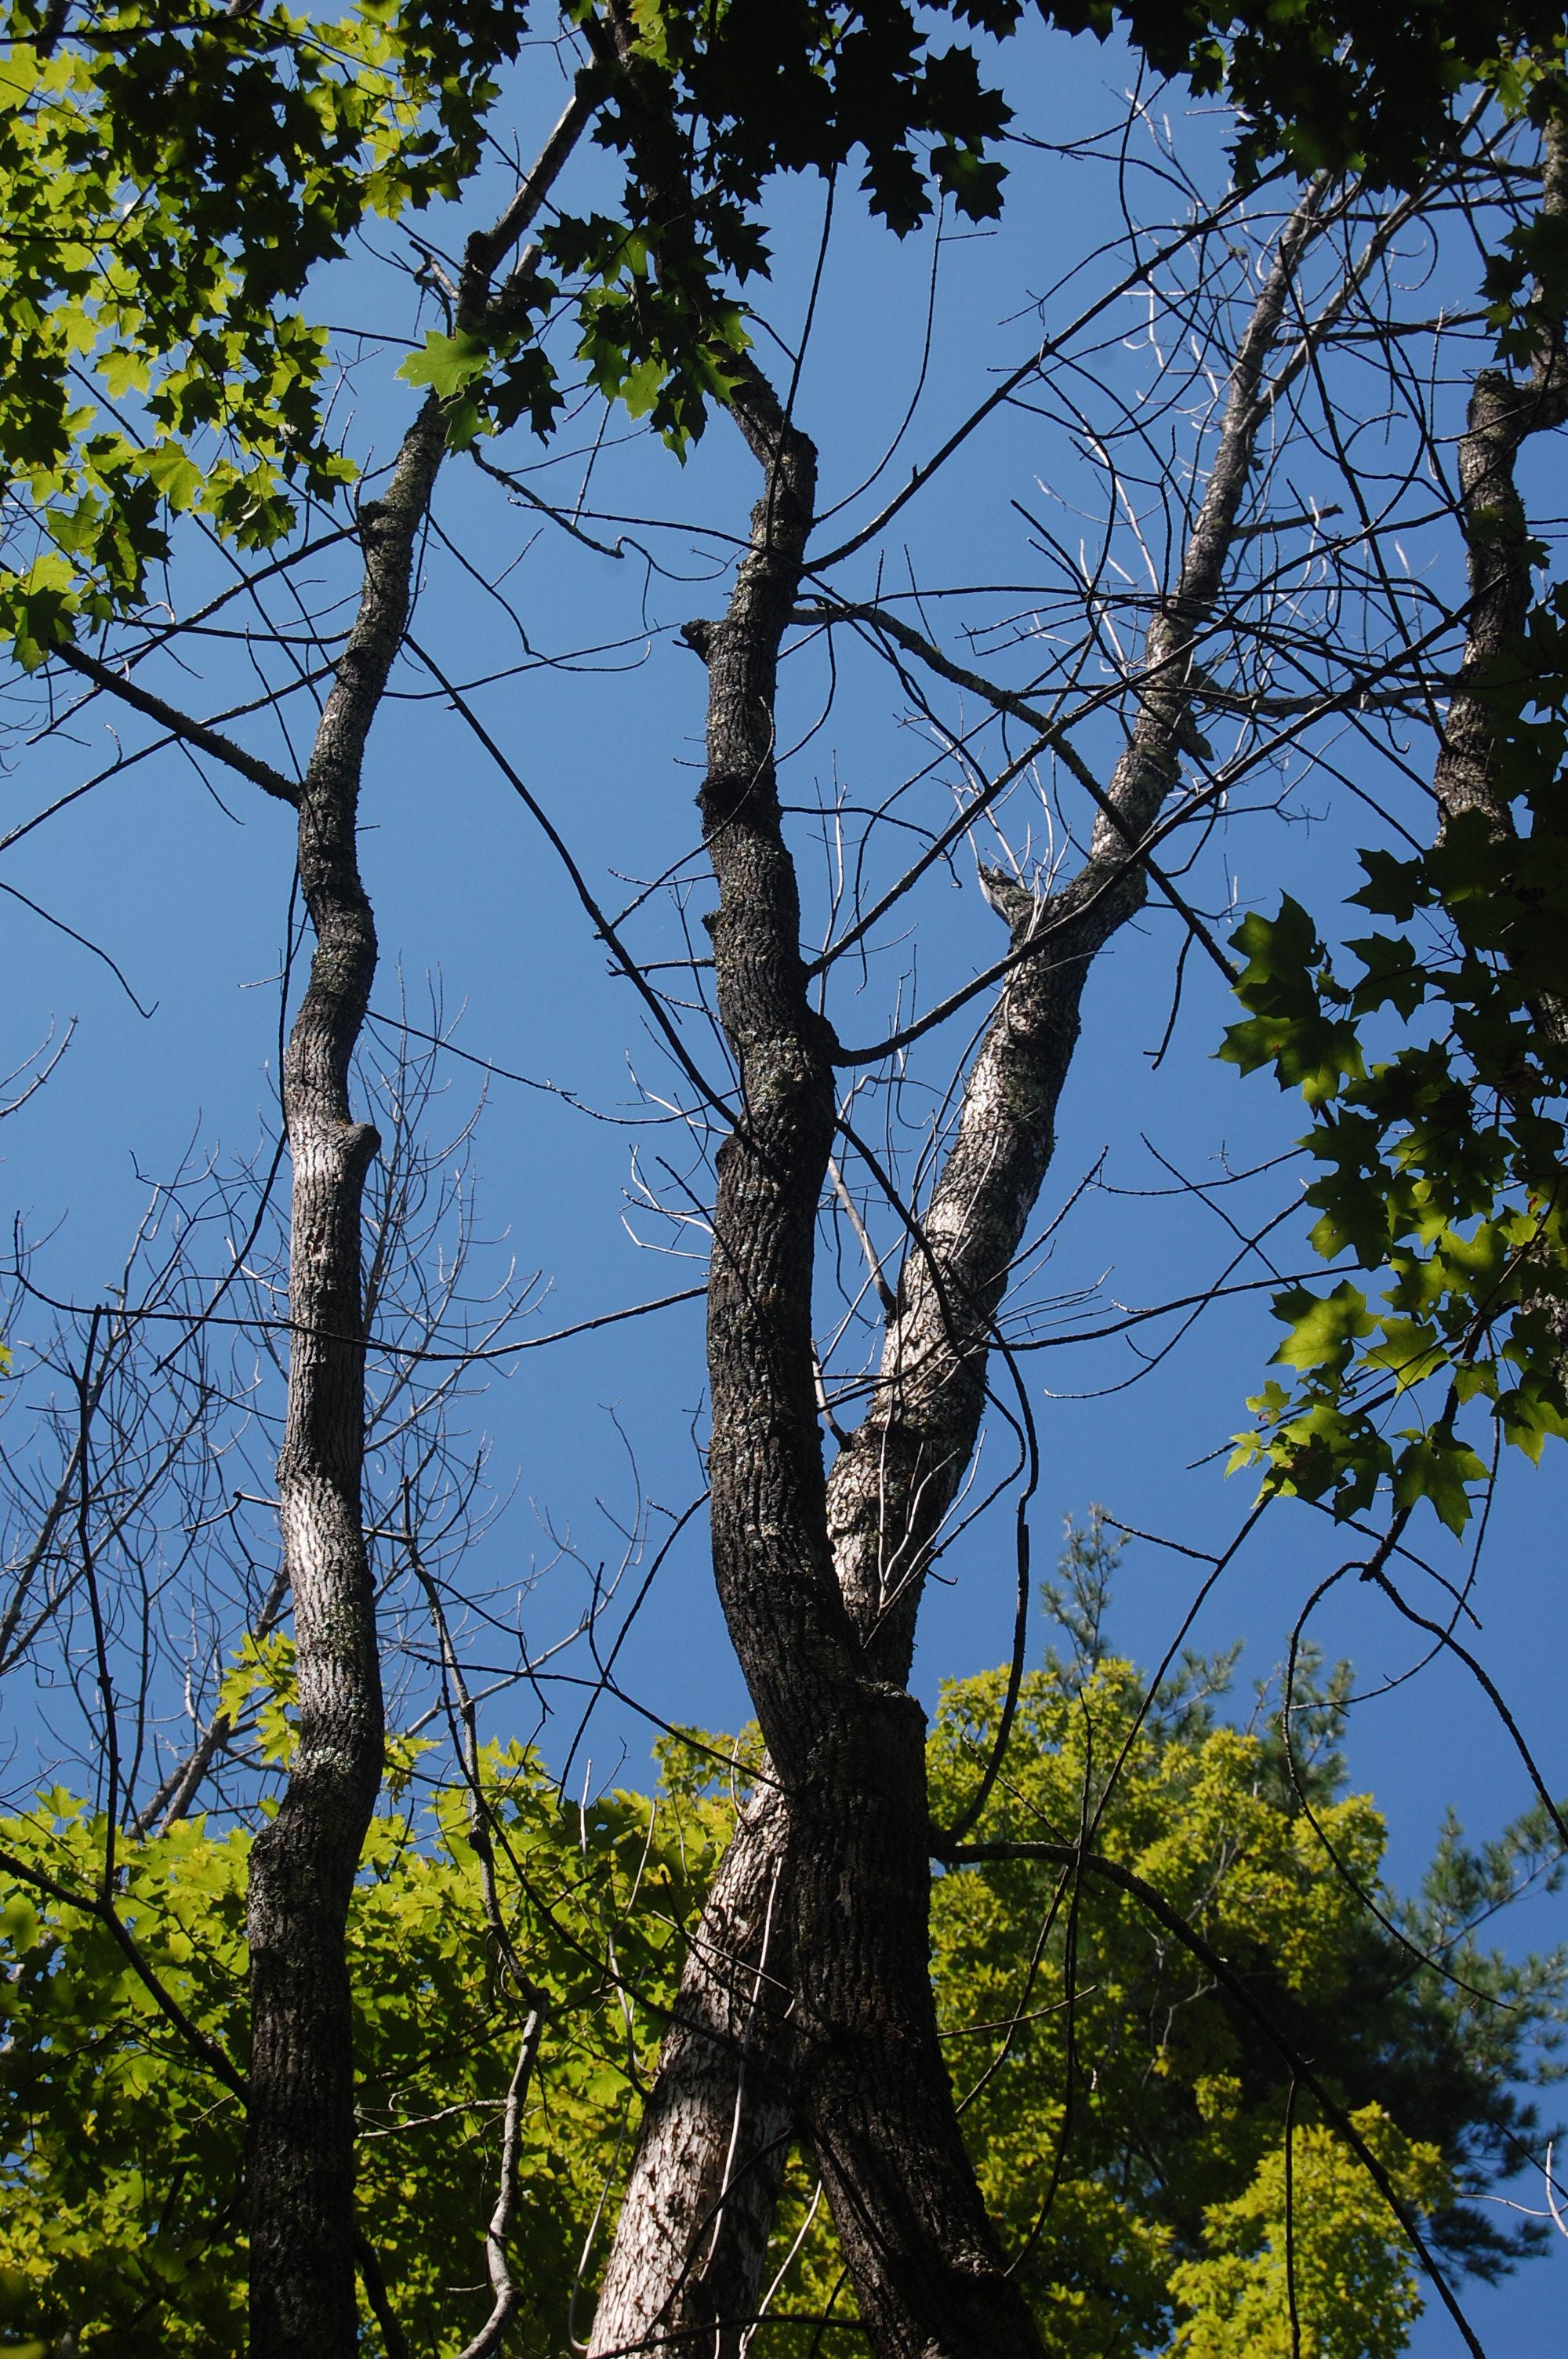 the invasive emerald ash borer has killed millions of